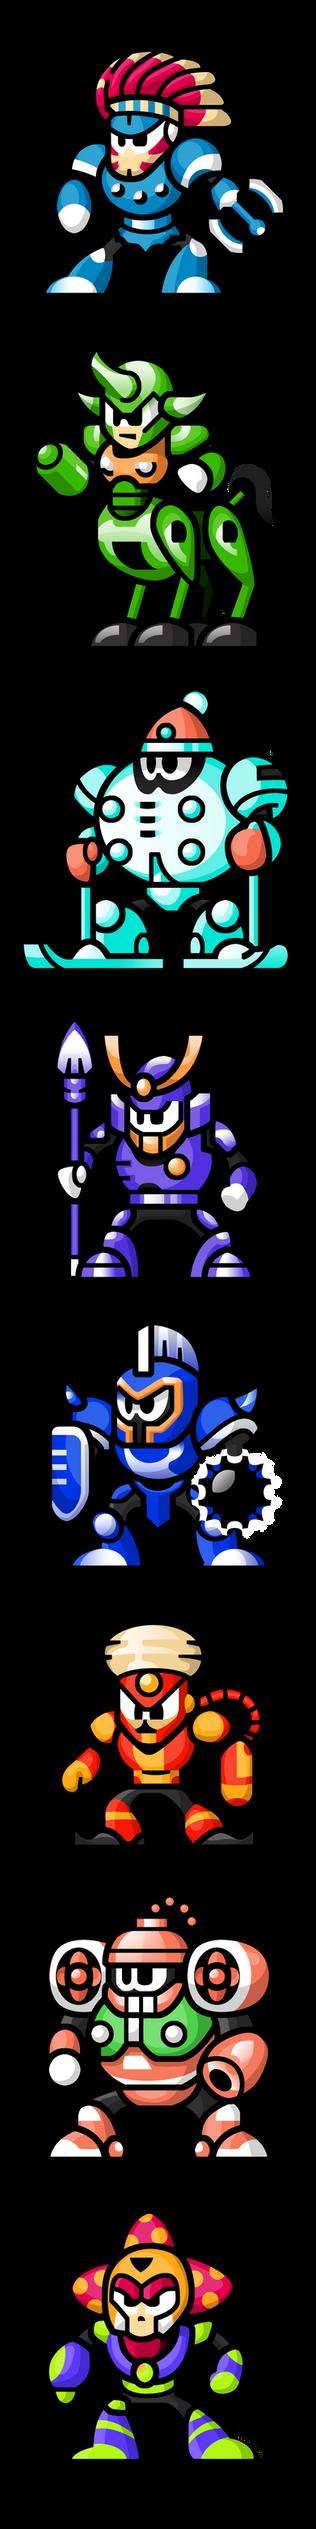 "MegaMan ""Sprites""-Bosses of 6 by WaneBlade"